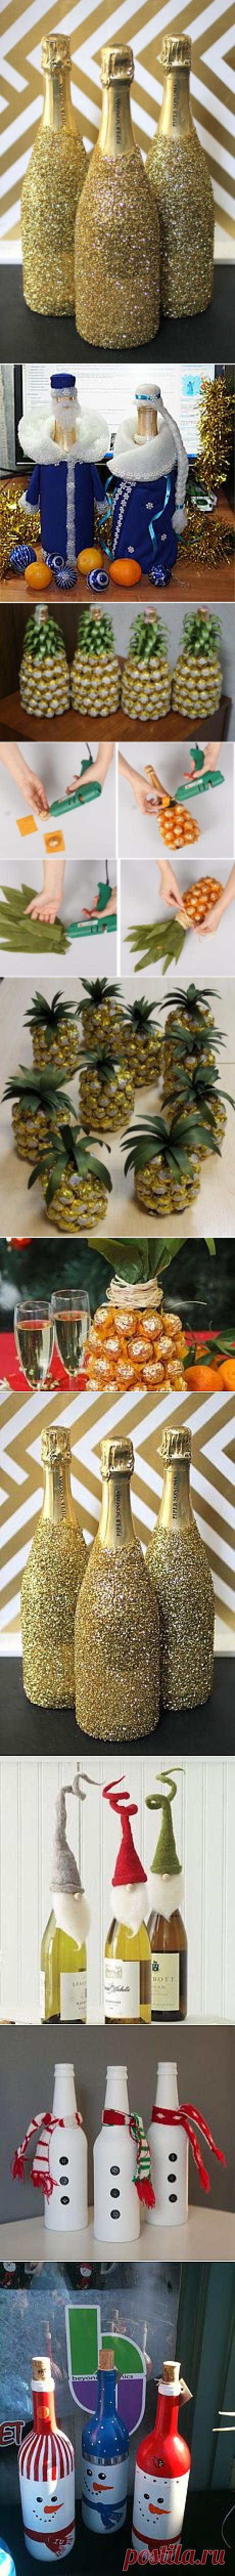 Search on Postila: New Year's decor of bottles